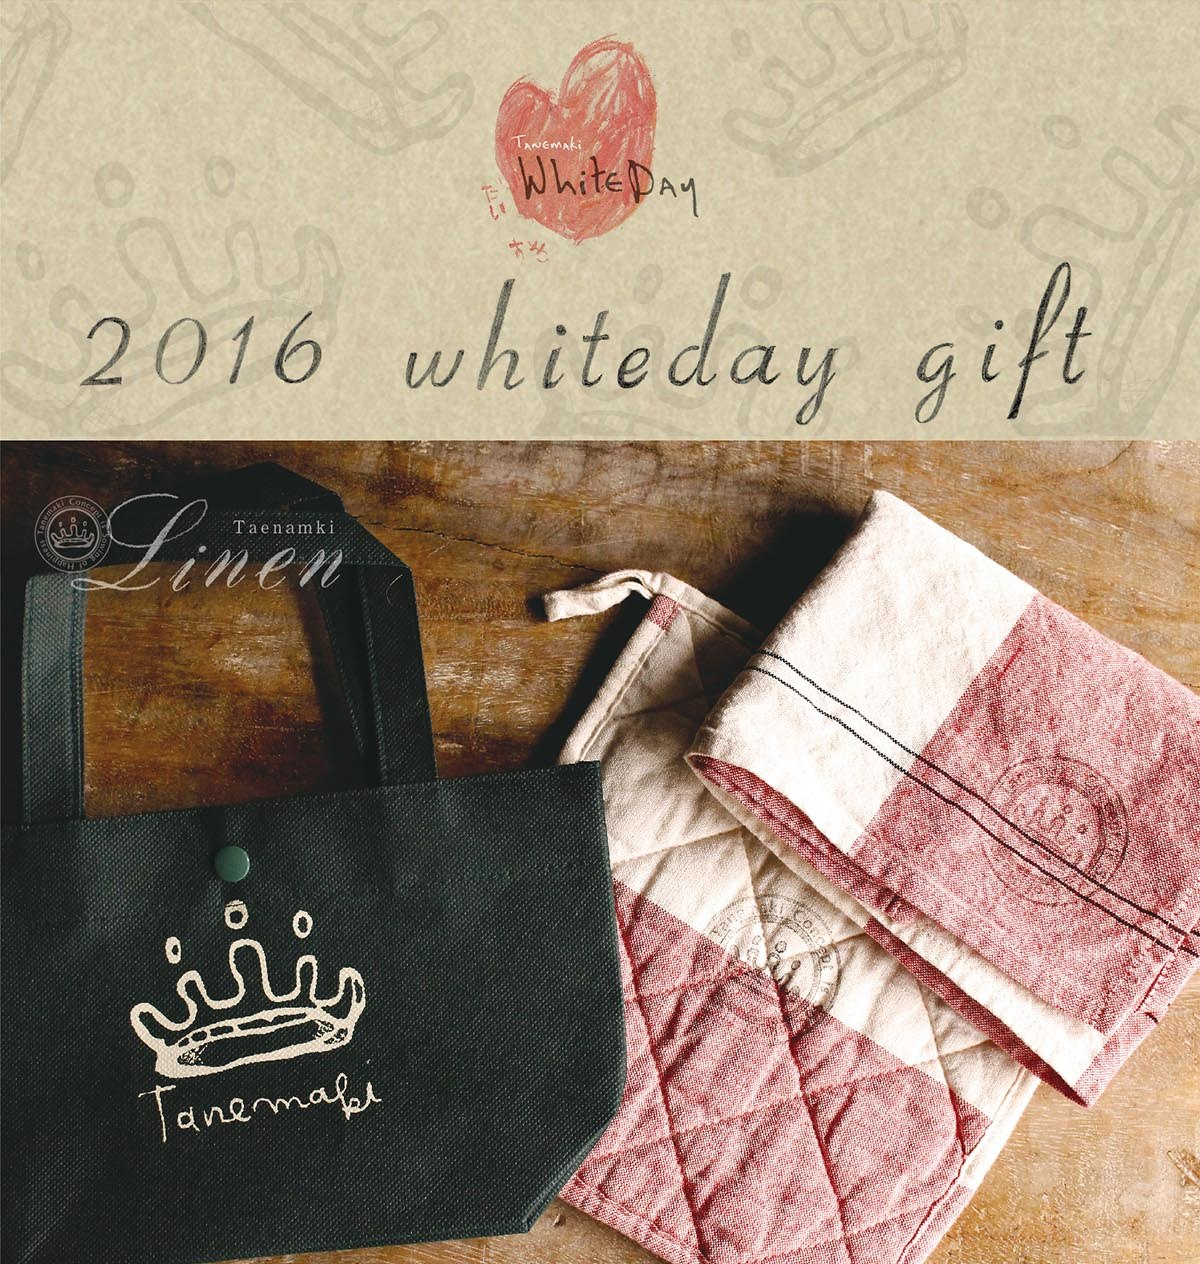 2016_WhiteDay_HP_big1-1.jpg